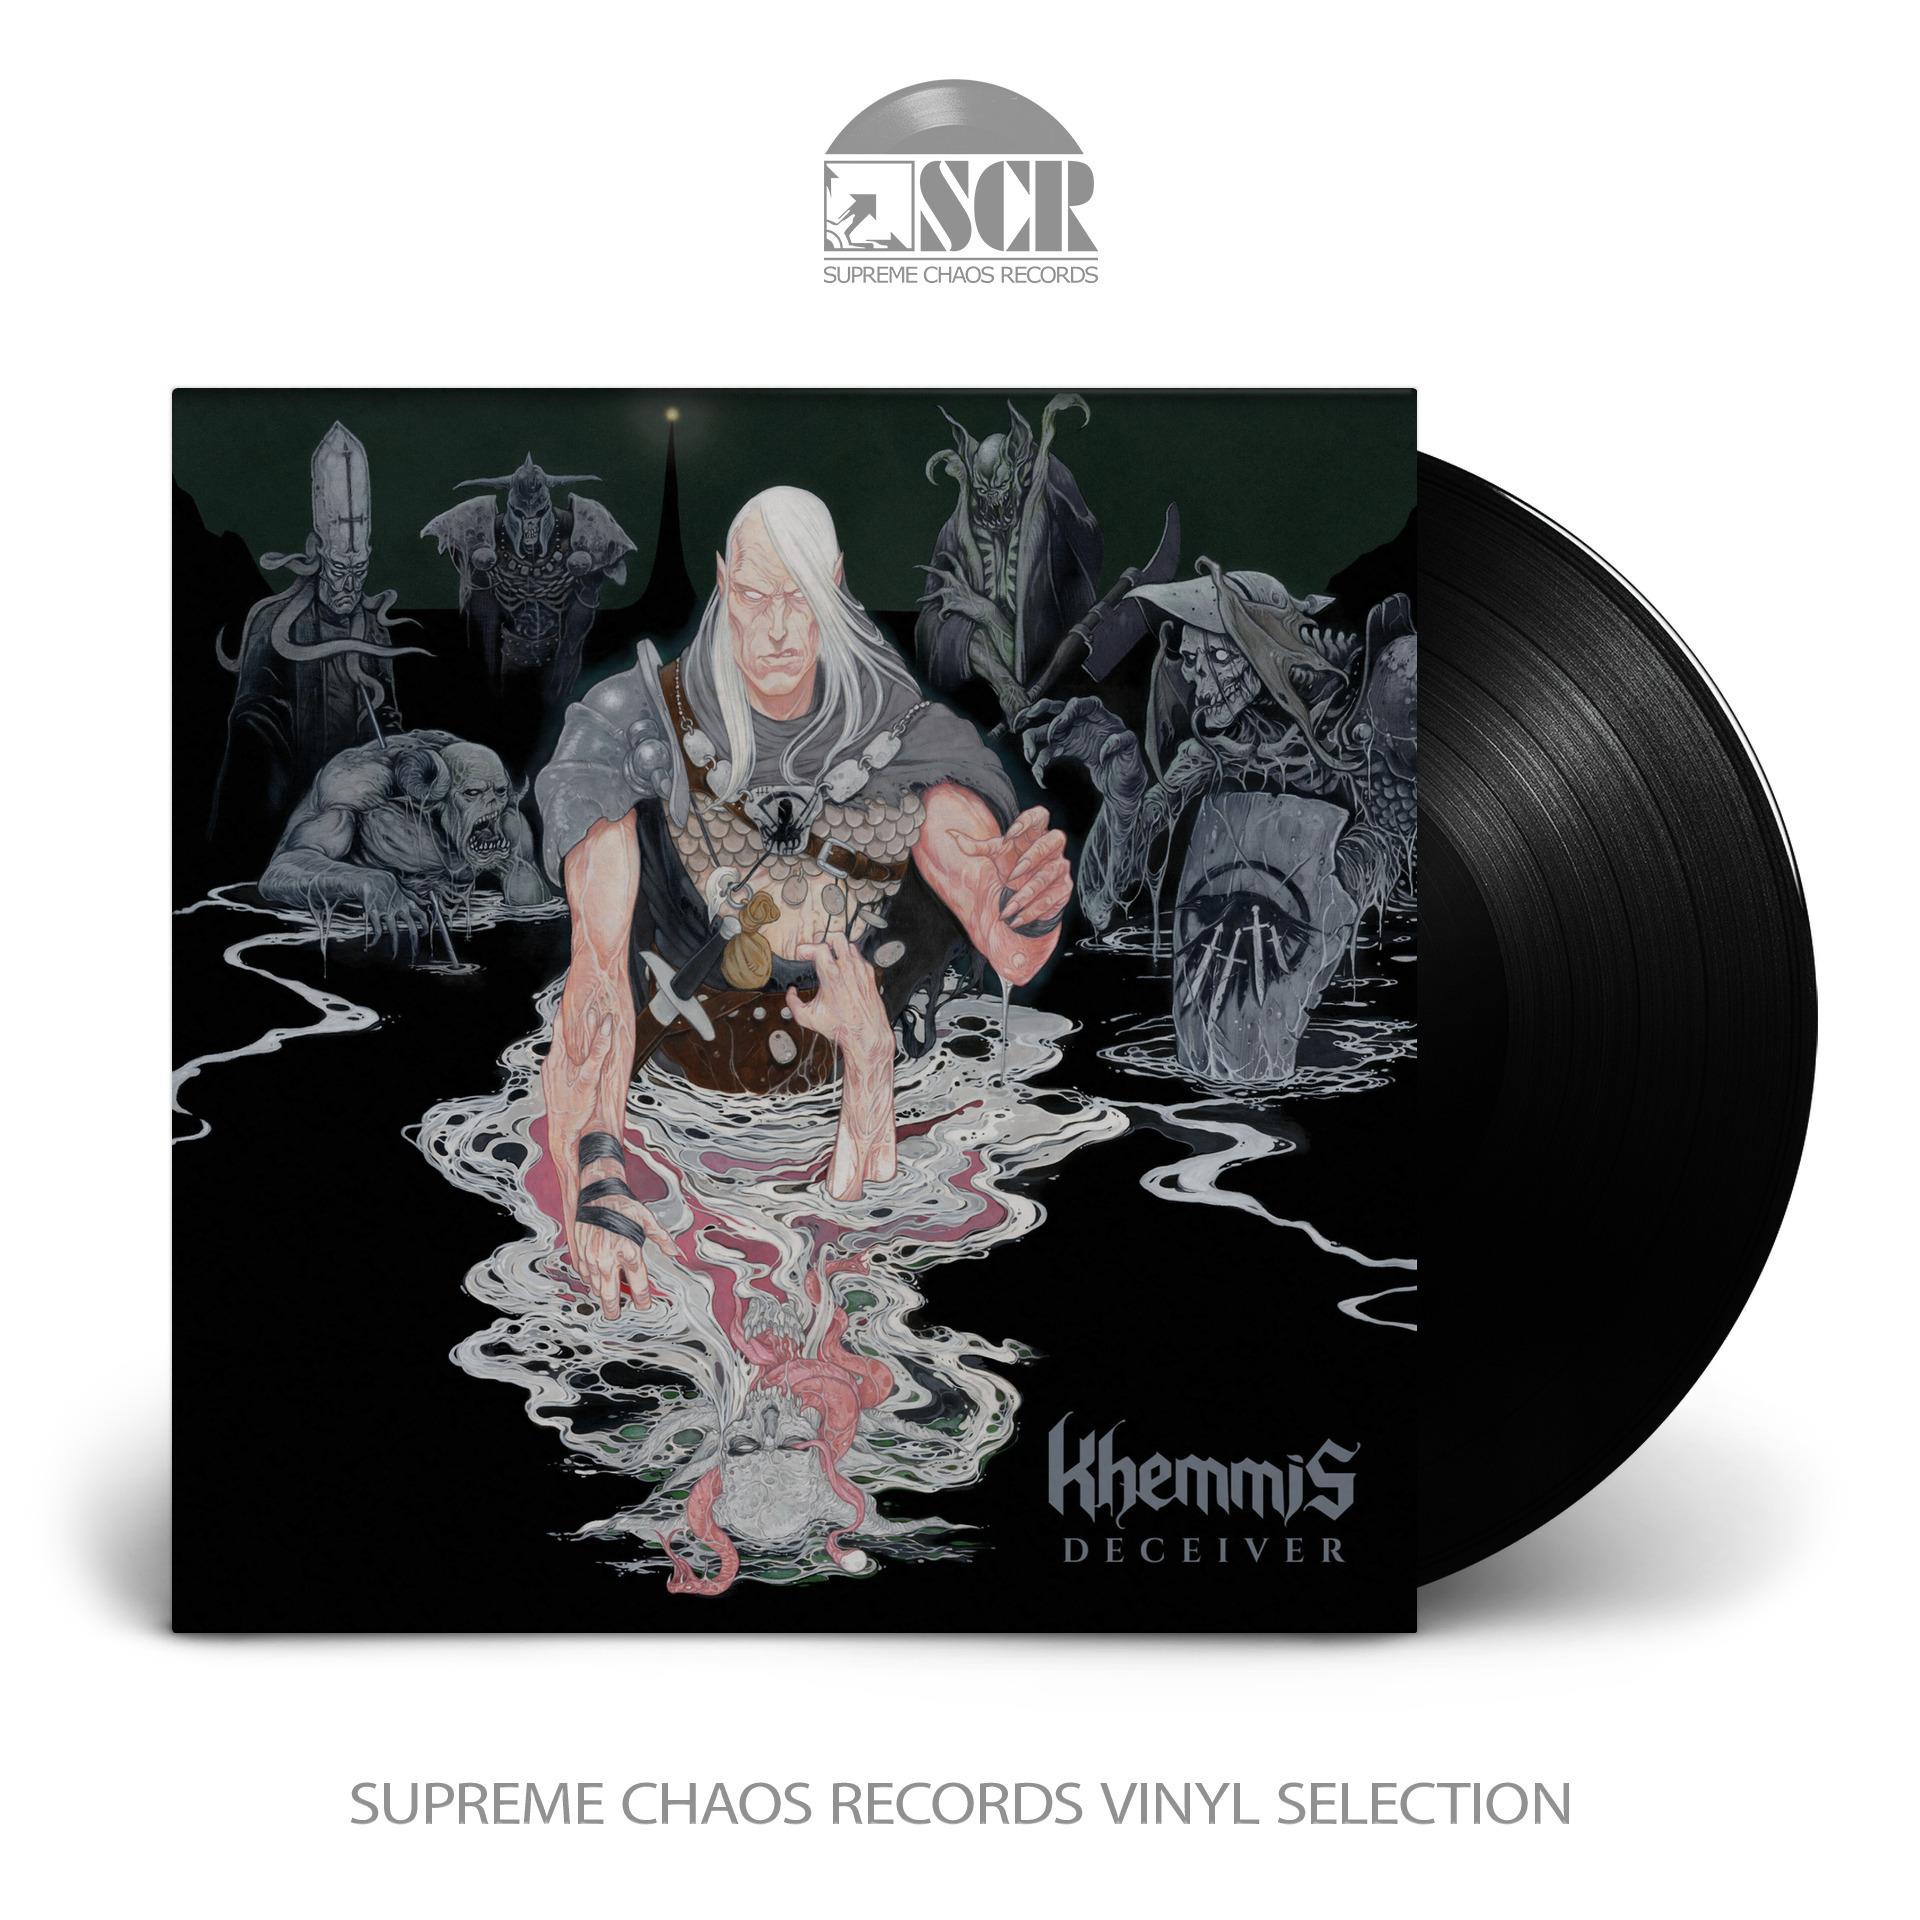 KHEMMIS - Deceiver [BLACK] (LP)